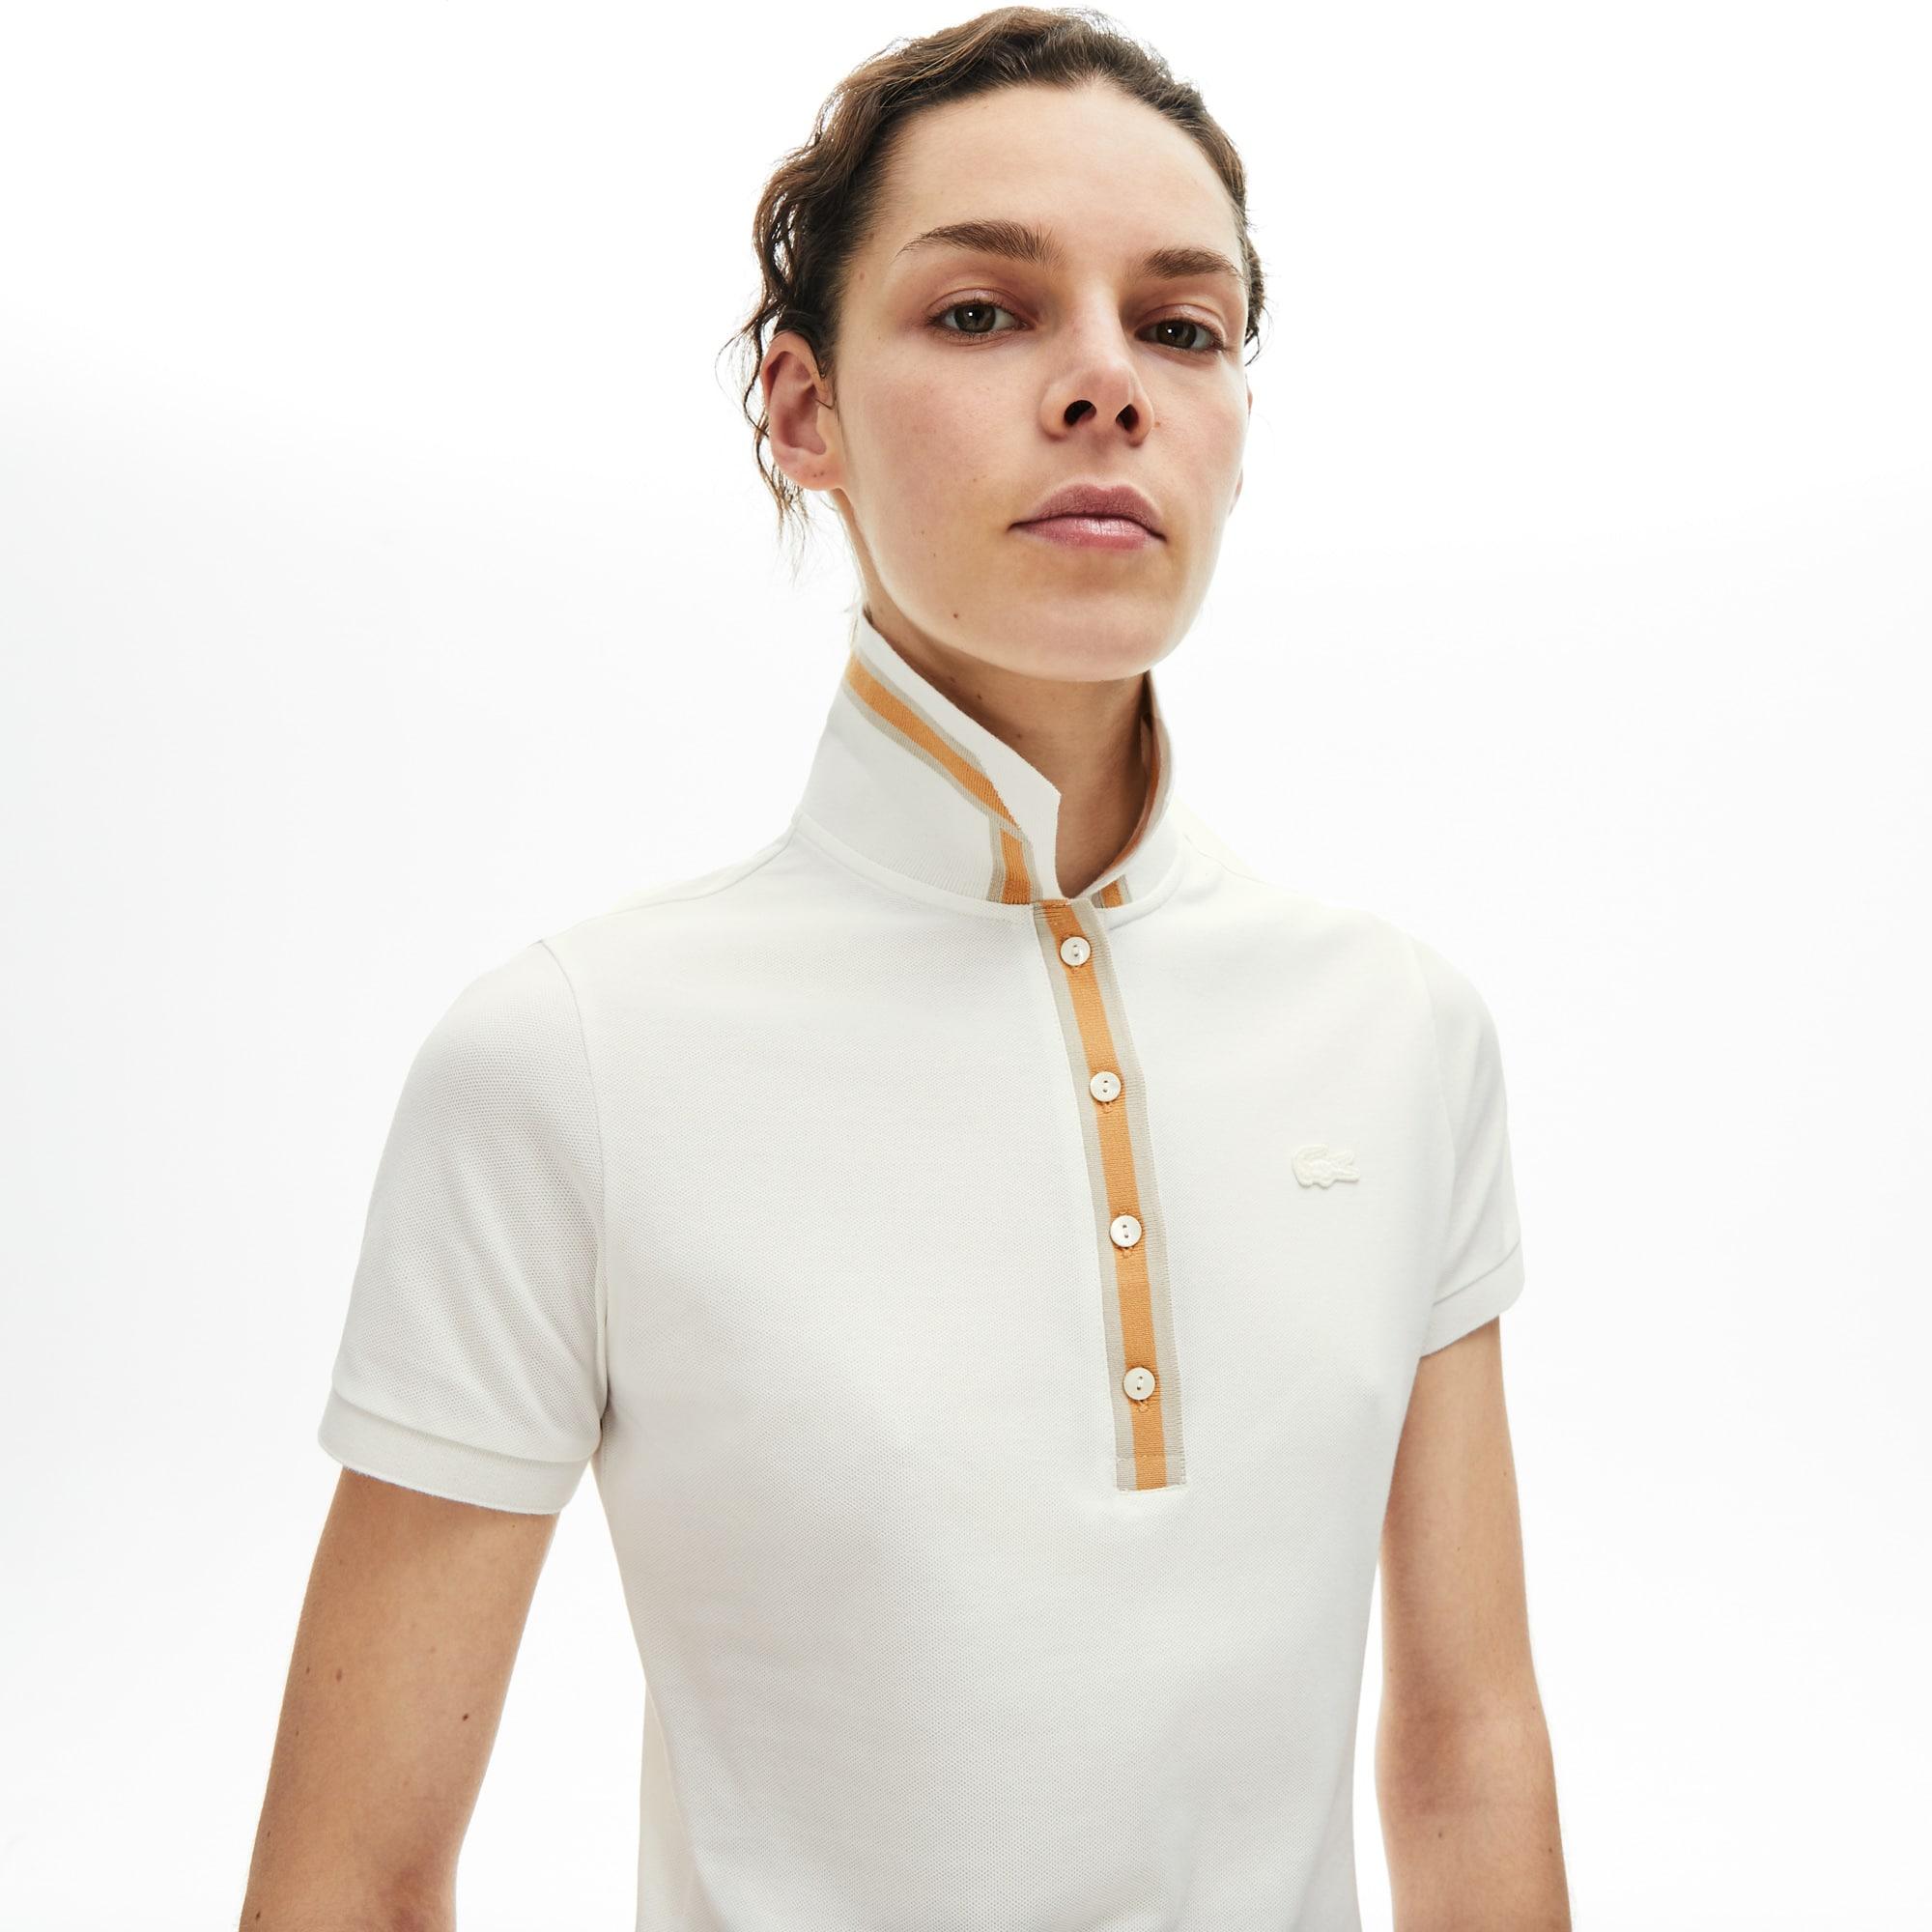 Women's Lacoste Contrast Stretch Cotton Polo Shirt